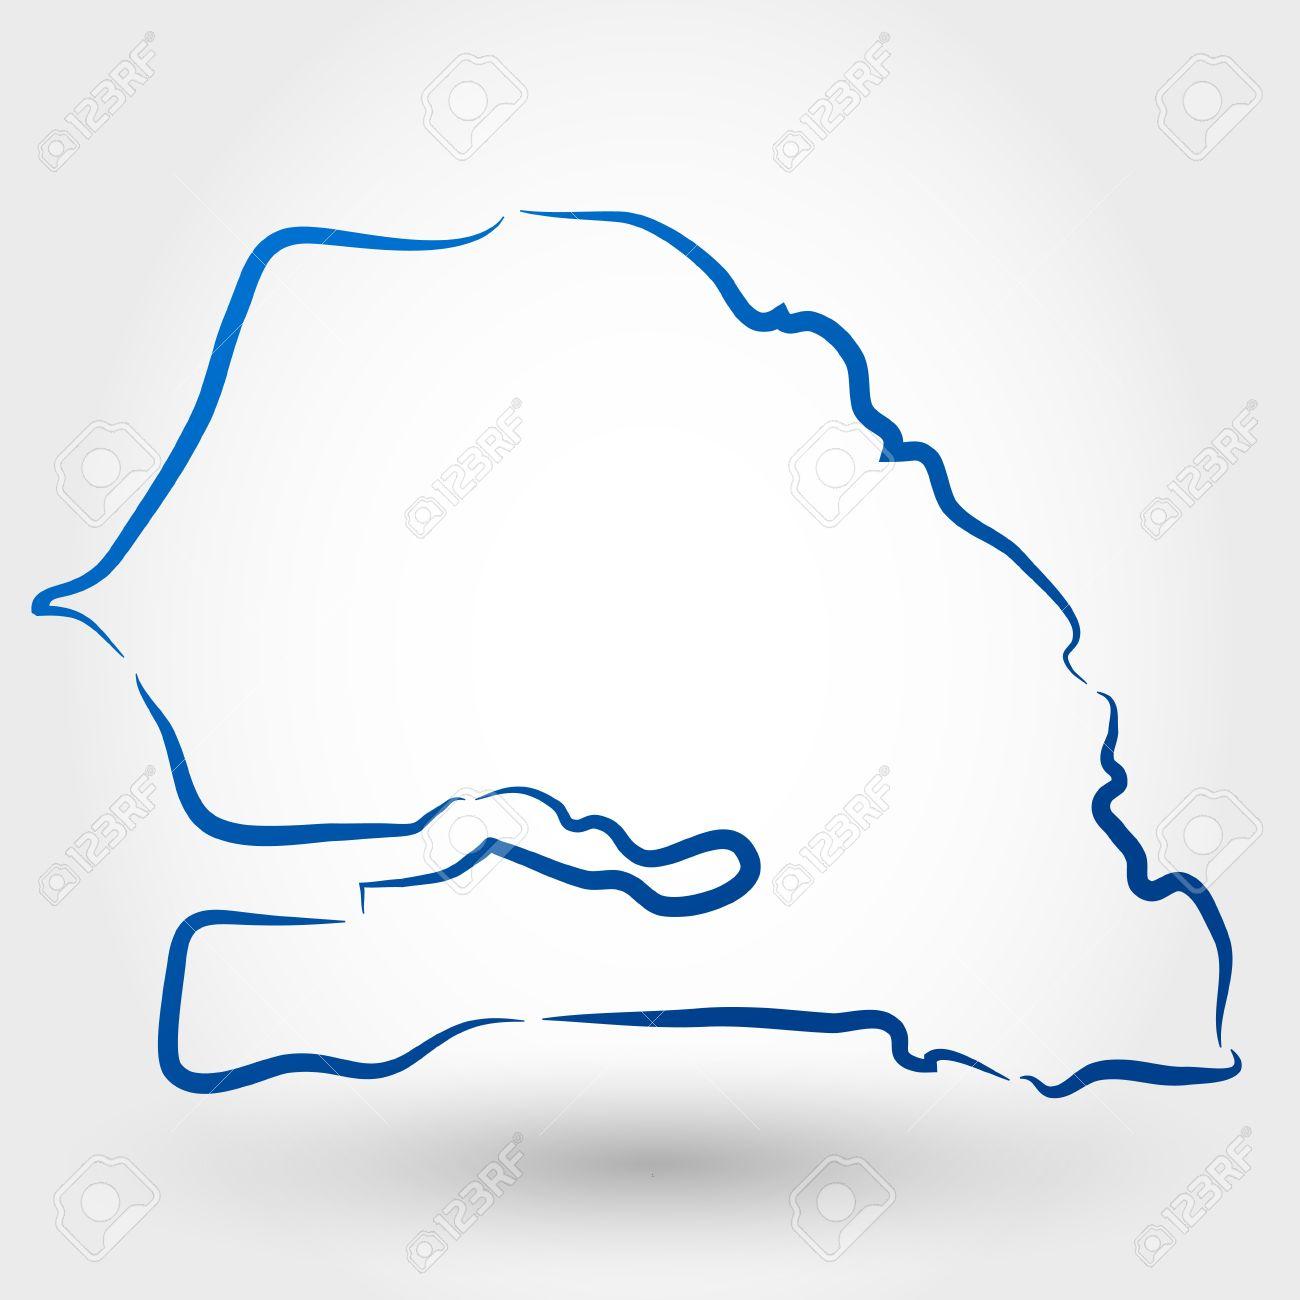 Map Of Senegal Map Concept Royalty Free Cliparts Vectors And - Senegal map vector